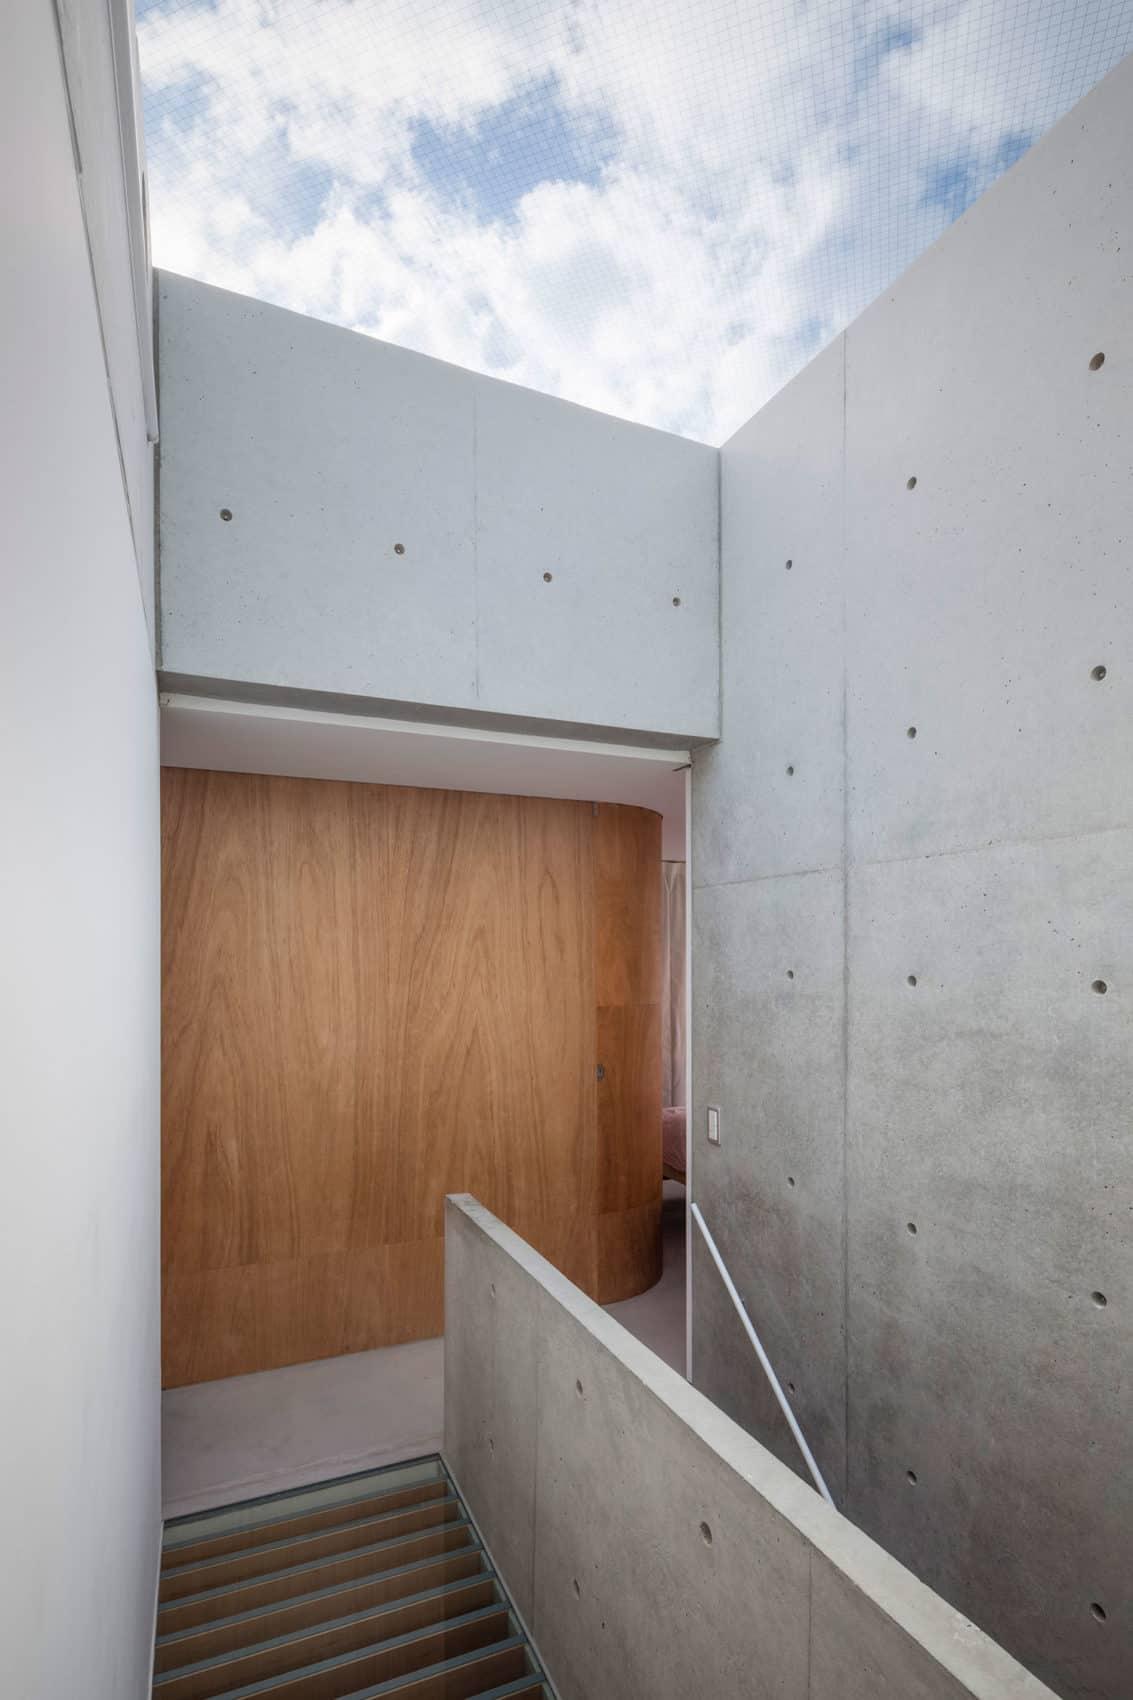 House in Midorigaoka by Yutaka Yoshida Architect (11)